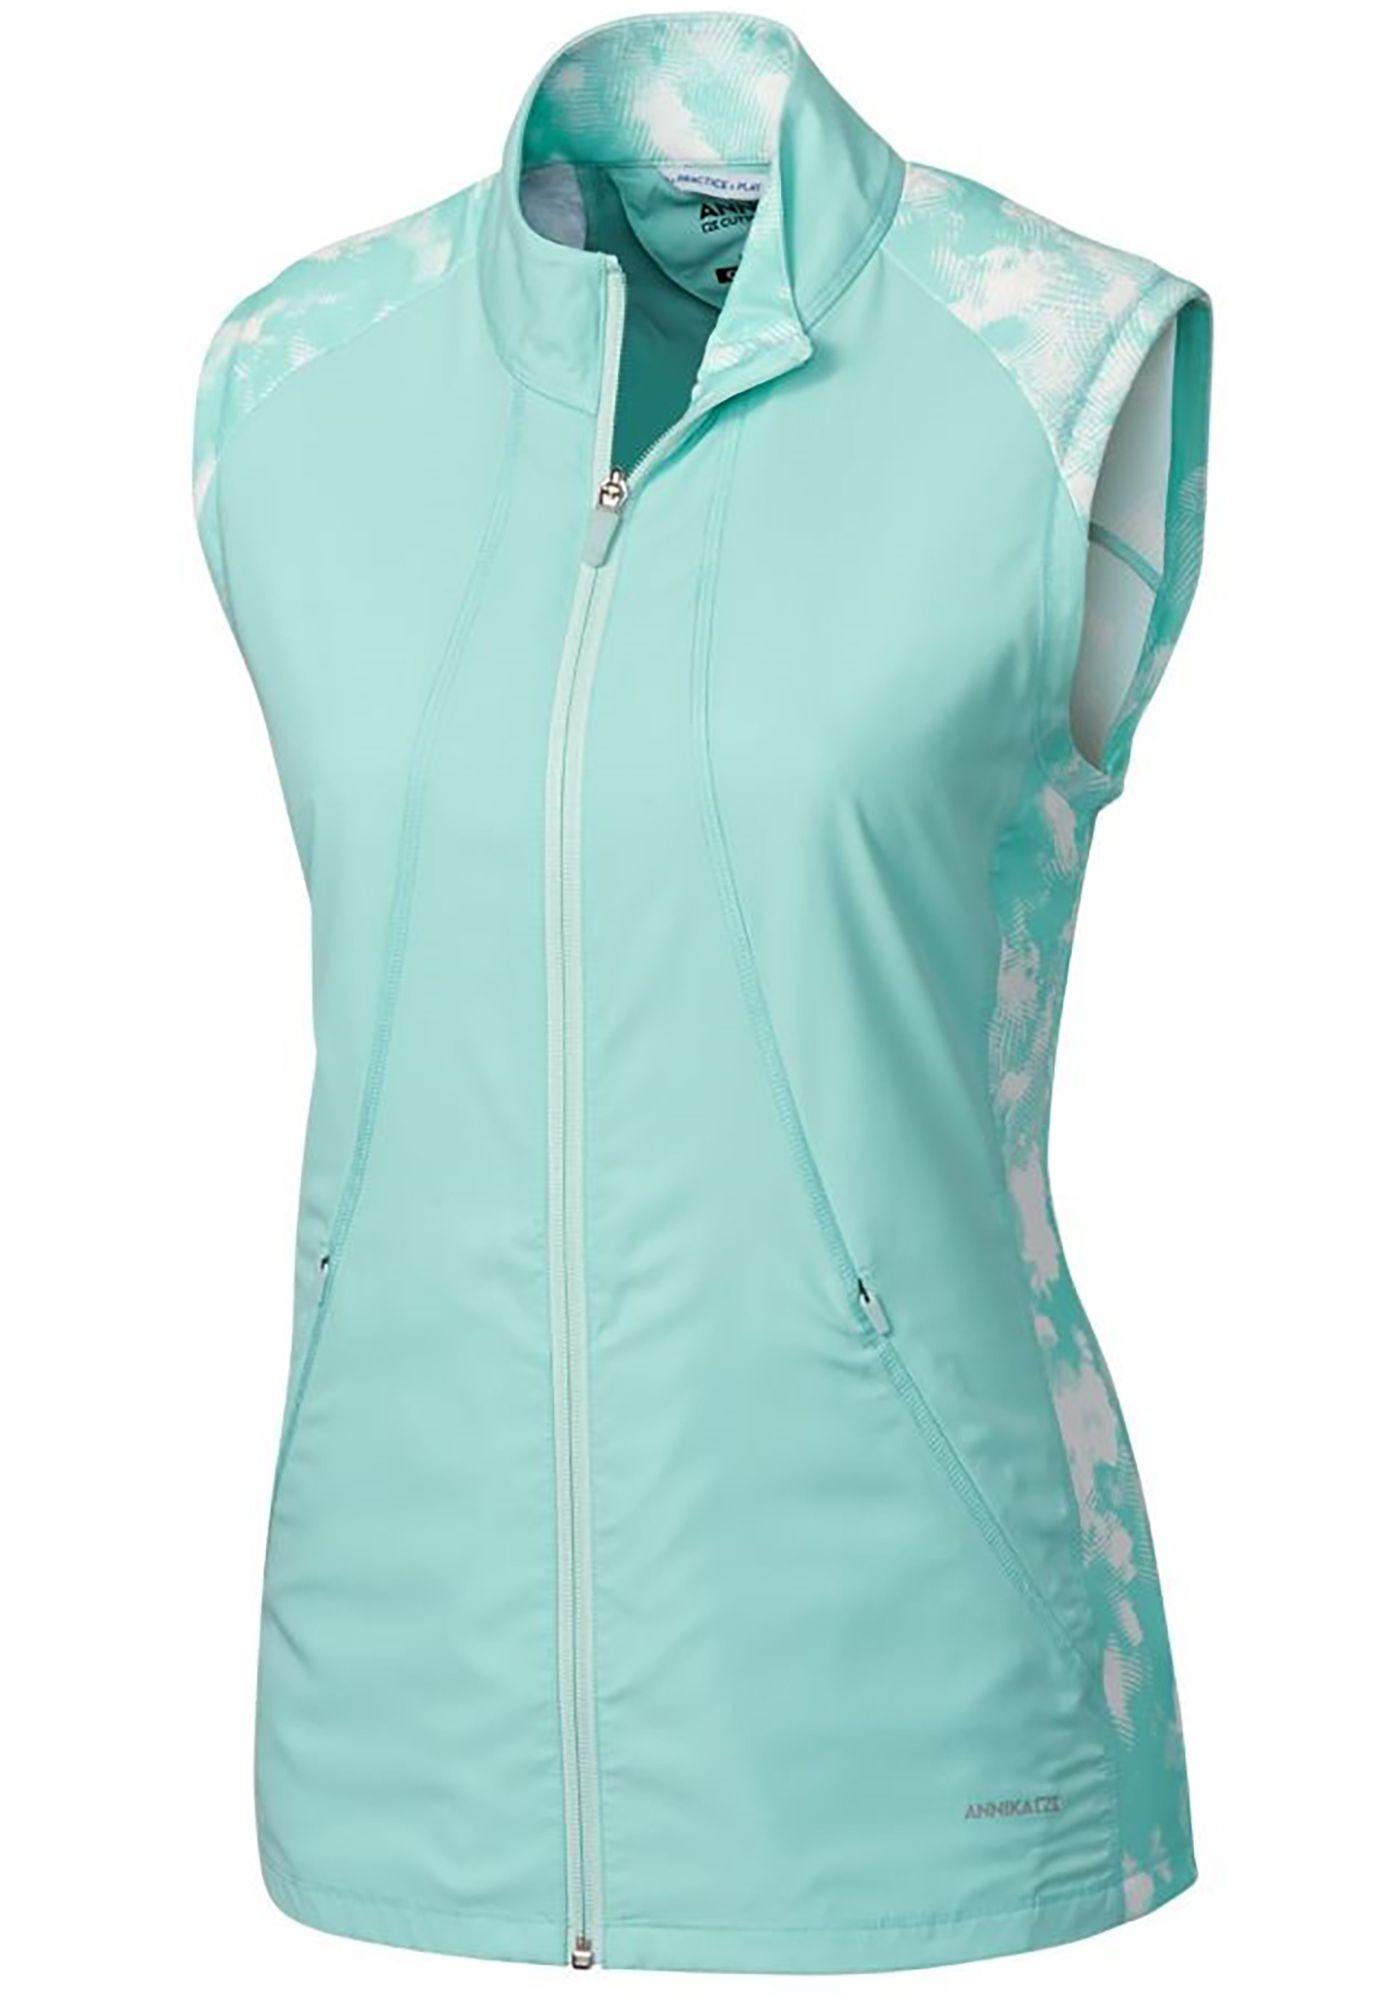 Cutter & Buck Women's Annika Energy Hybrid Golf Vest